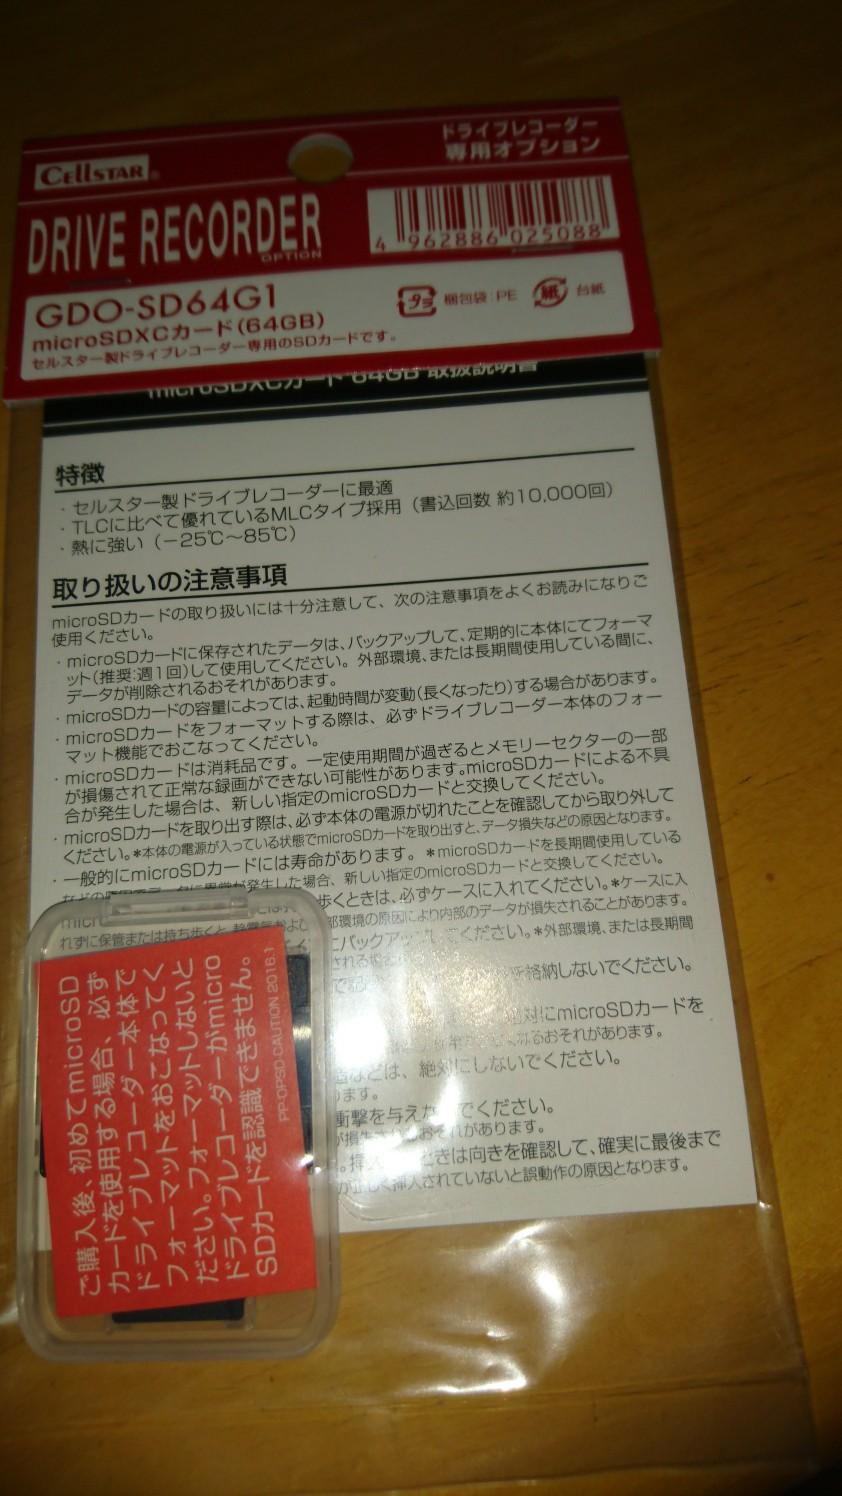 CELLSTAR ドラレコ専用オプションmicroSDXCカード(64GB)